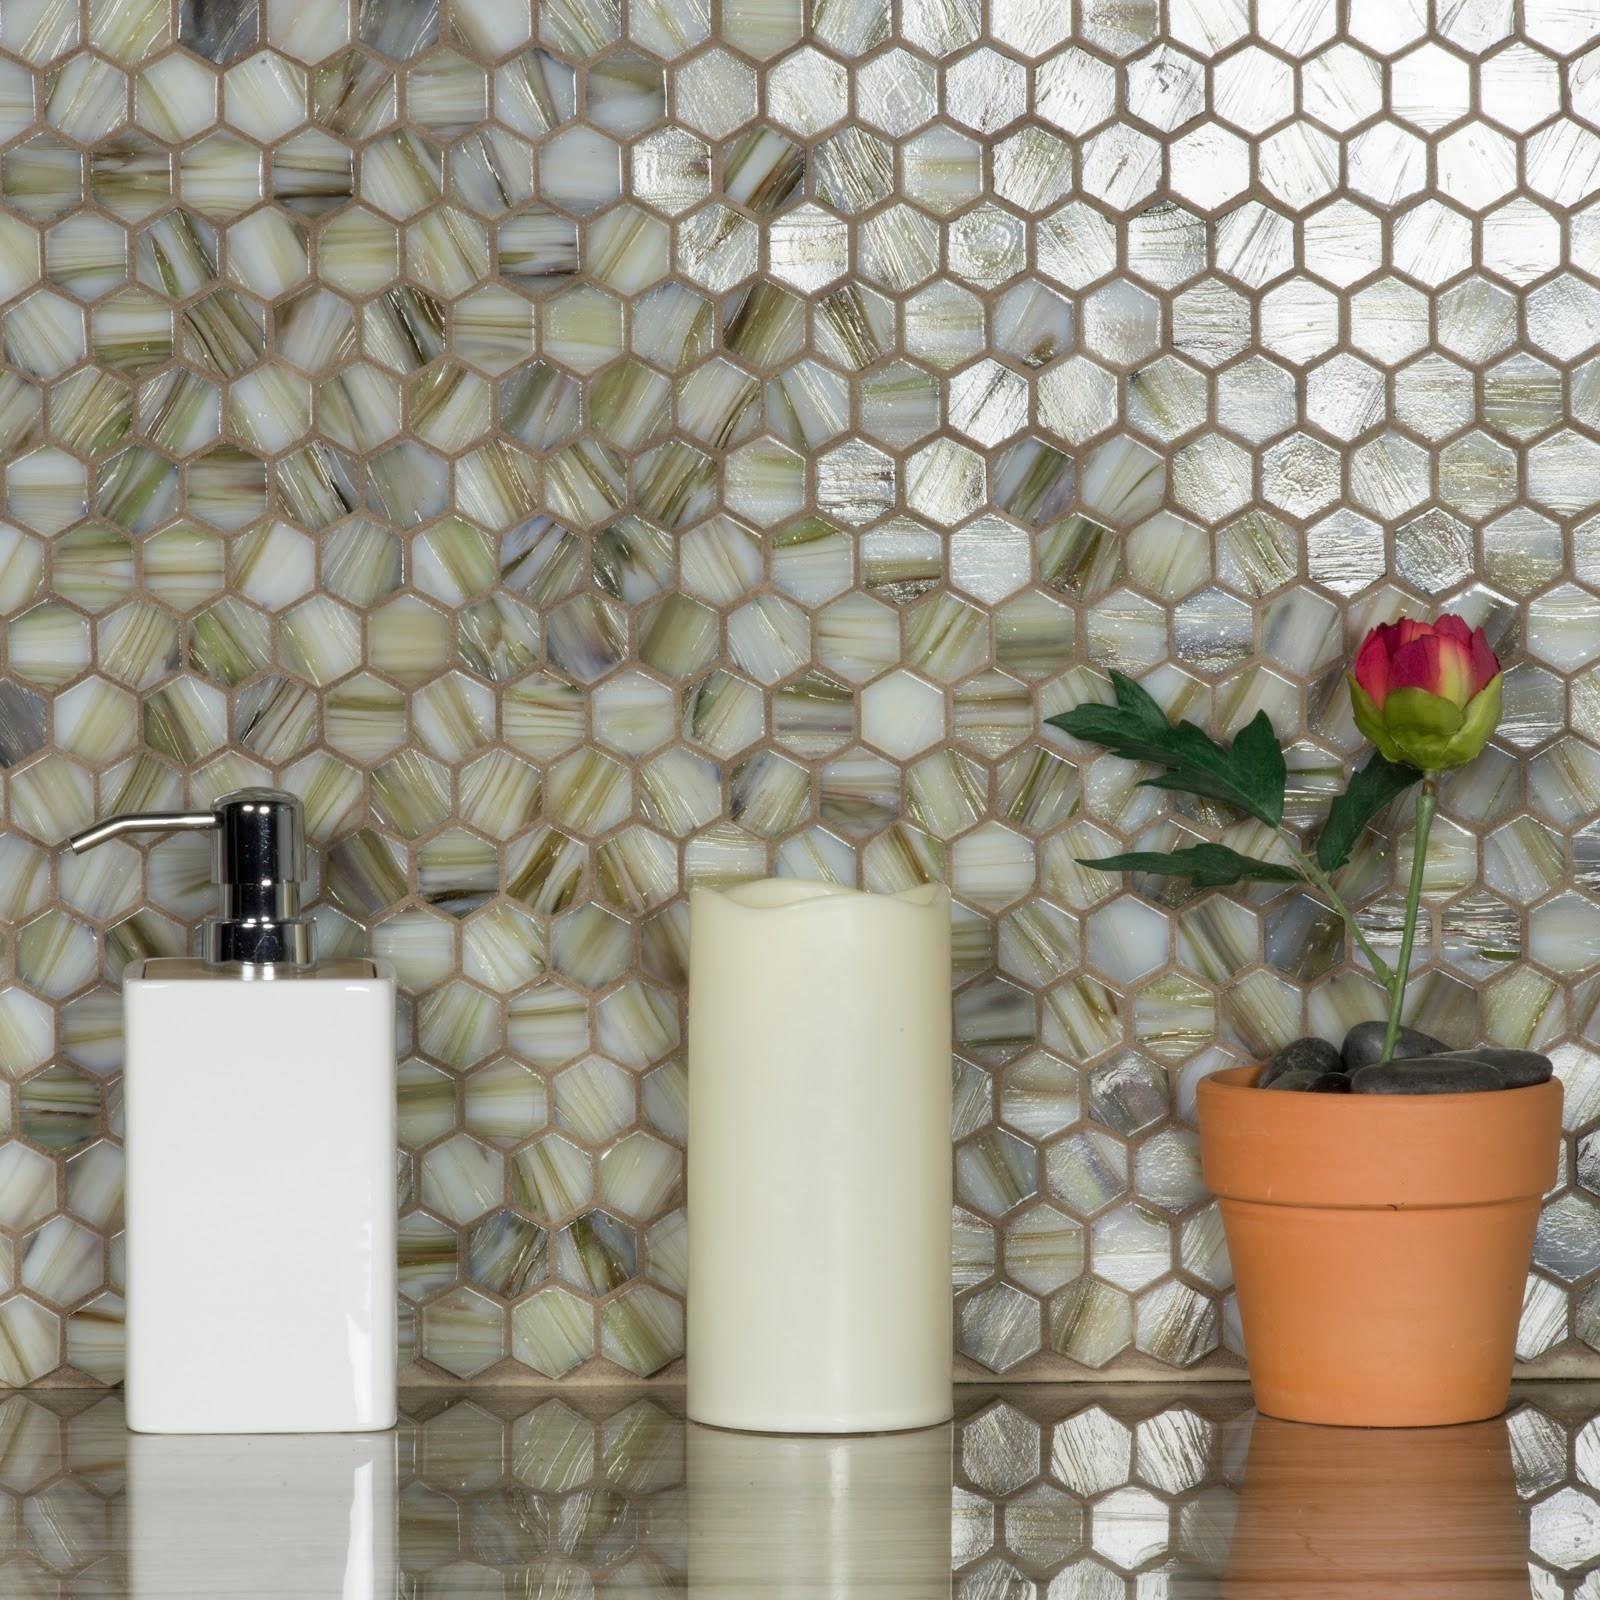 "Hexagon 1"" x 1"" Semi-Gloss Beige Glass Hexagon Backsplash Mosaic Wall & Floor Tile"